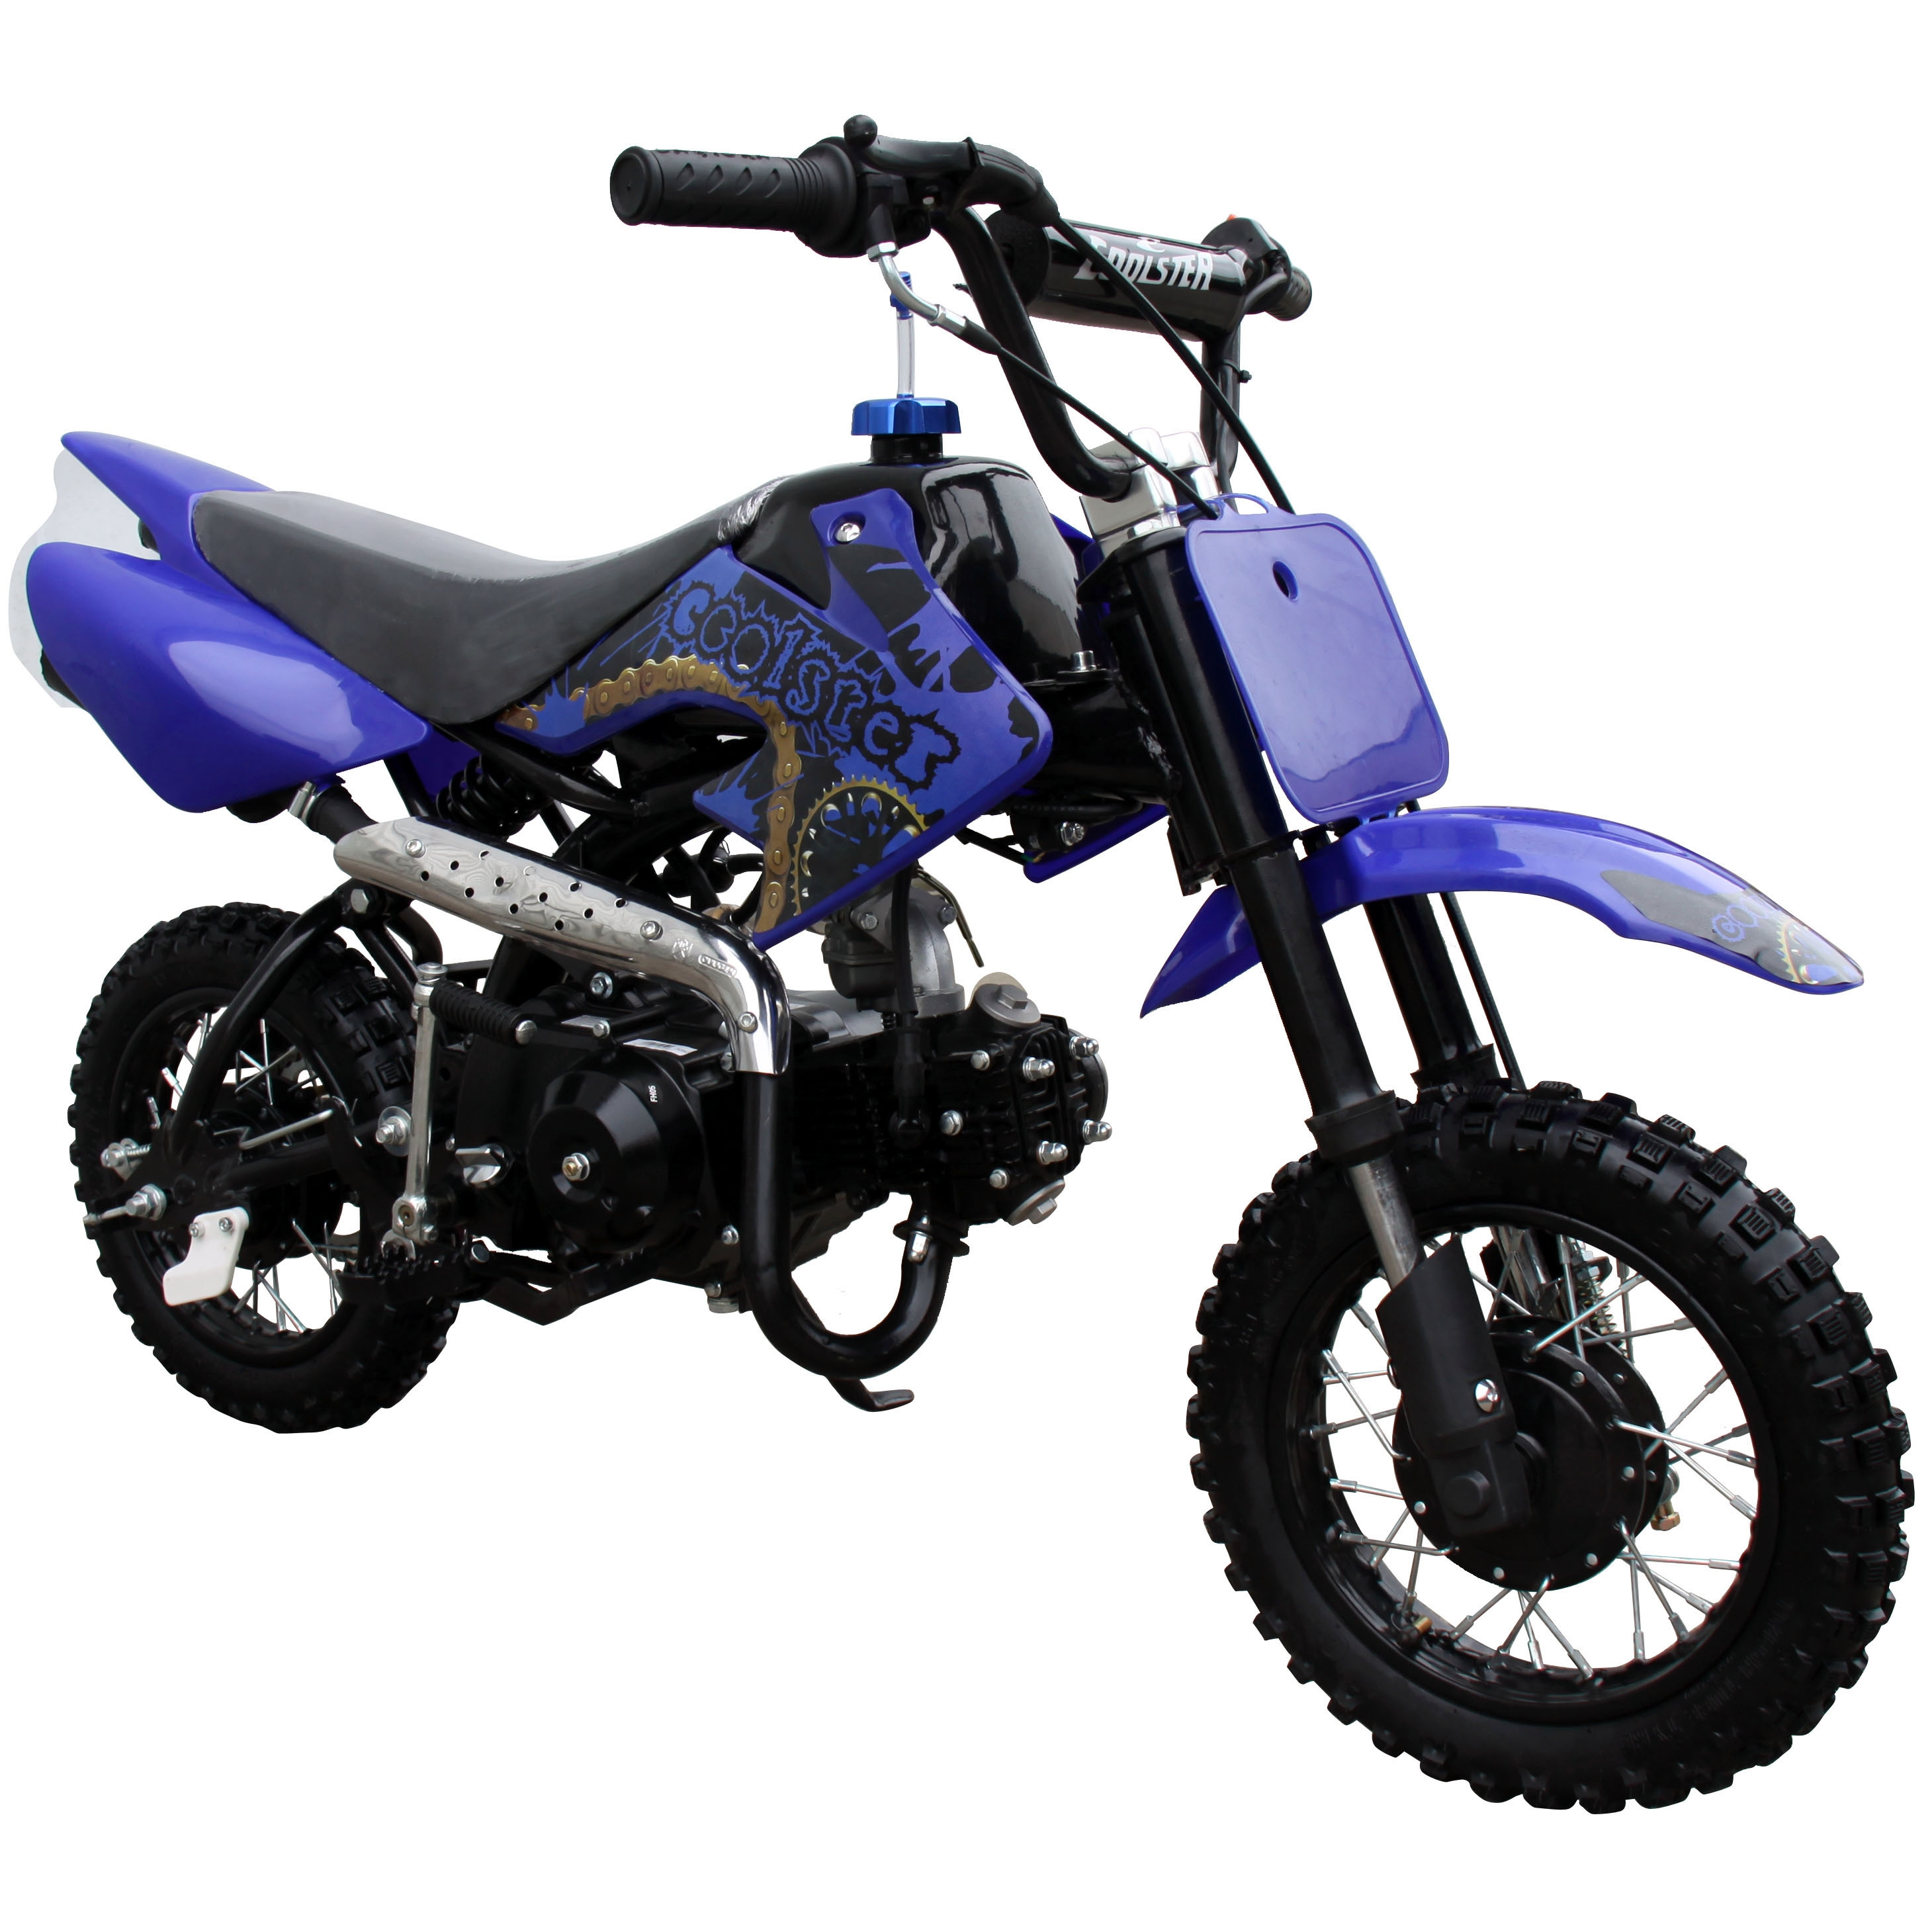 QG210 70cc Blue